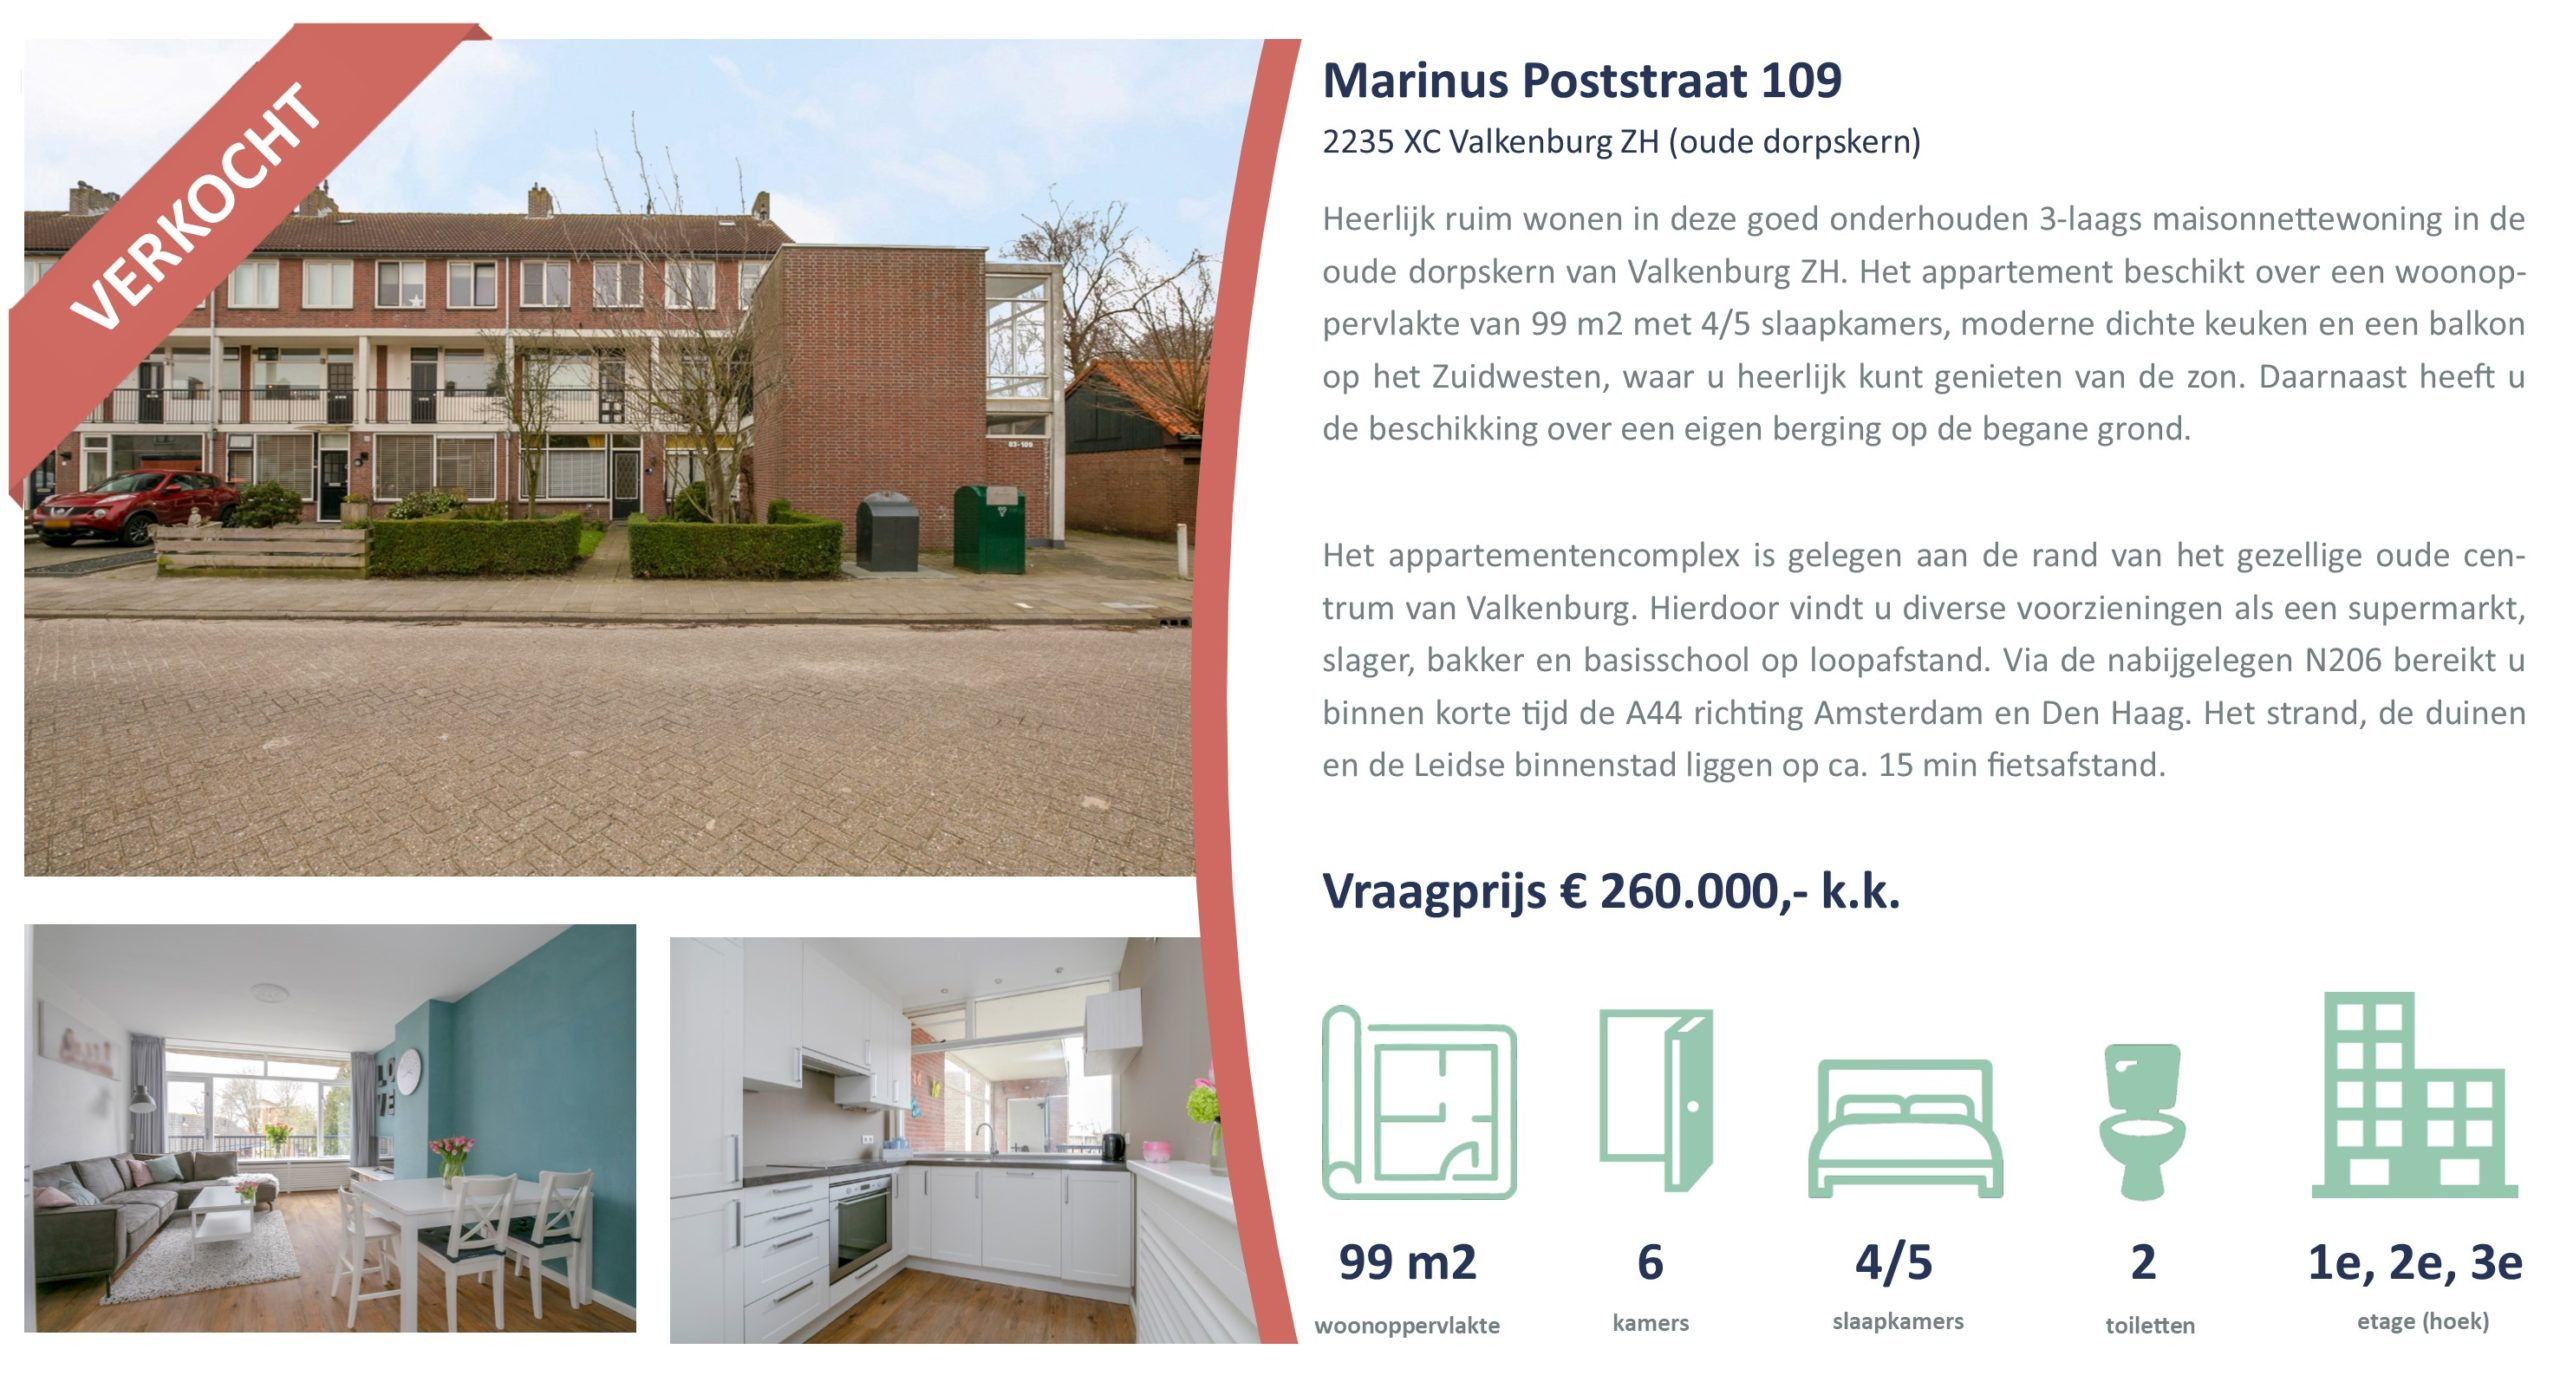 Marinus Poststraat 109, Valkenburg, Verkocht